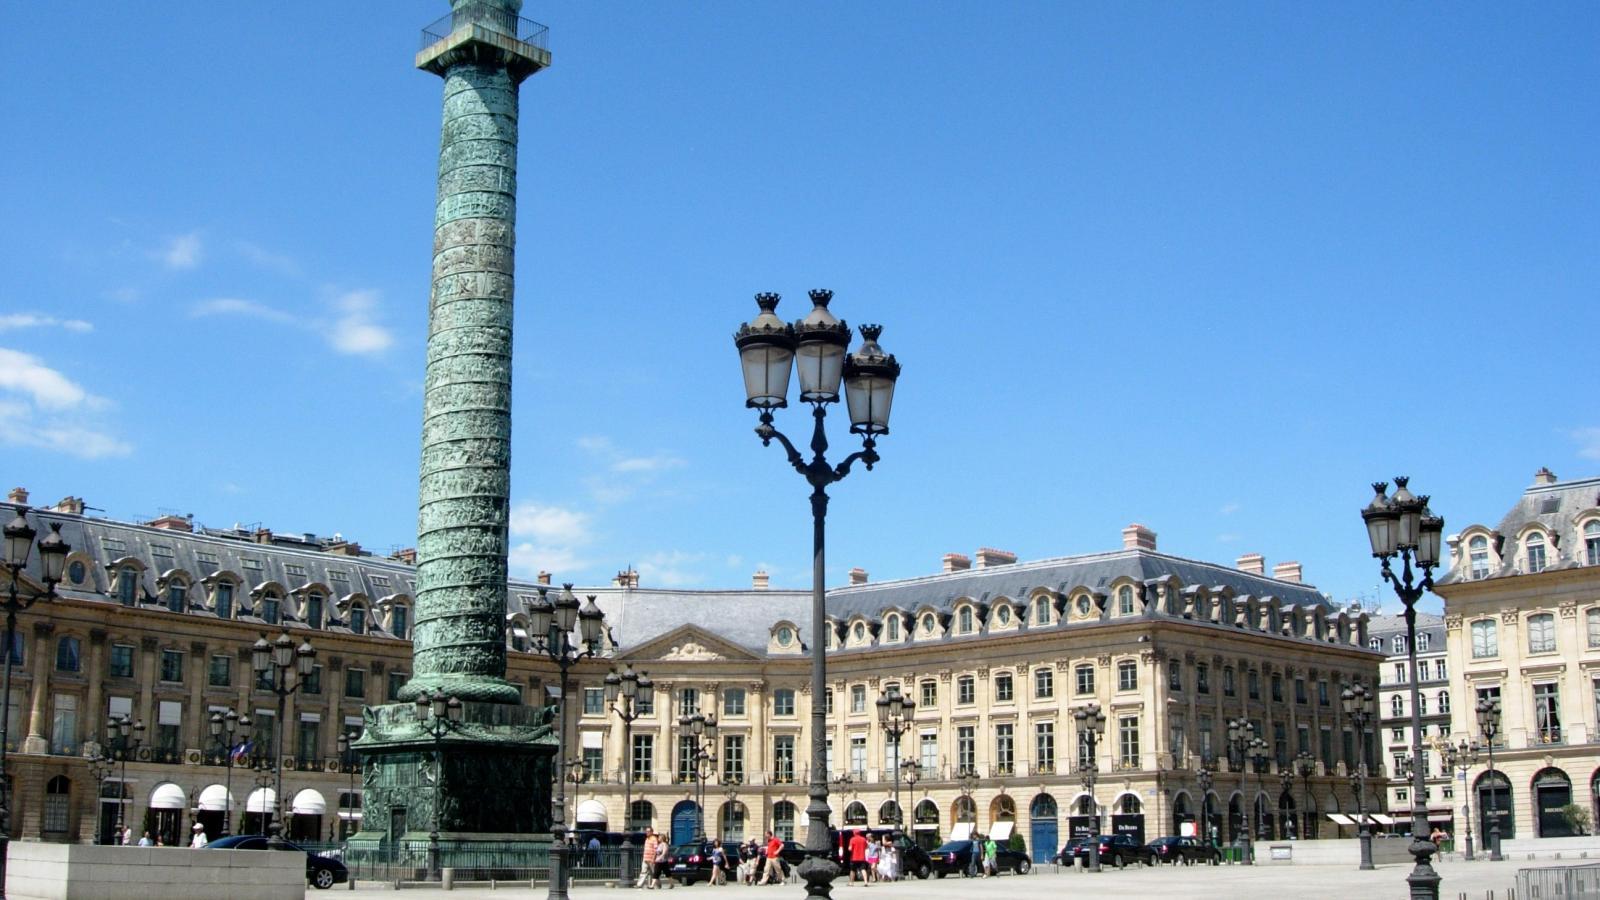 Presenting – Paris at Christmas